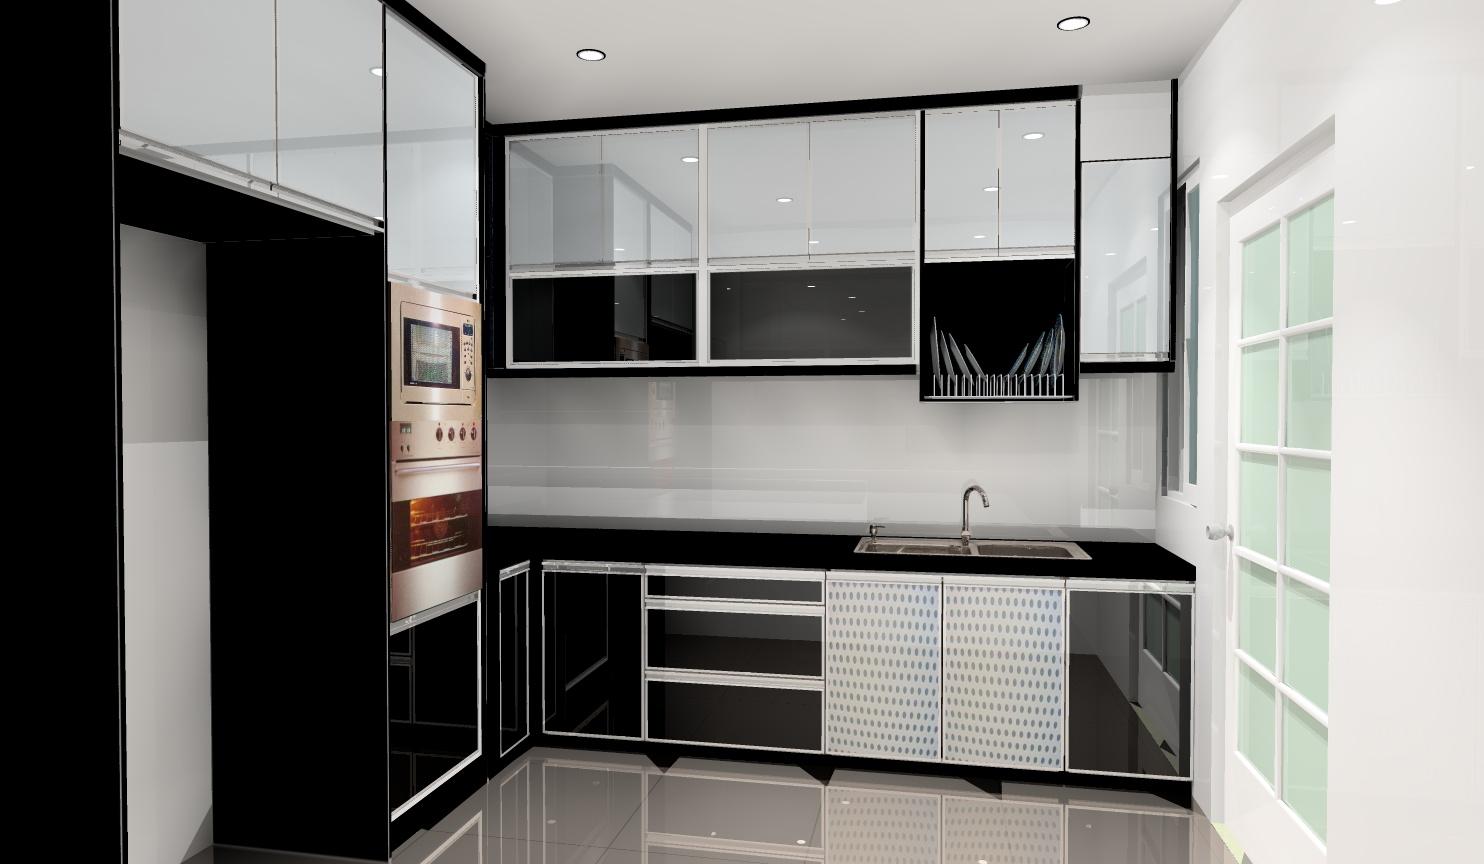 Jasa Furniture Murah Apartemen Dan Kontraktor Kitchen Set Jakarta